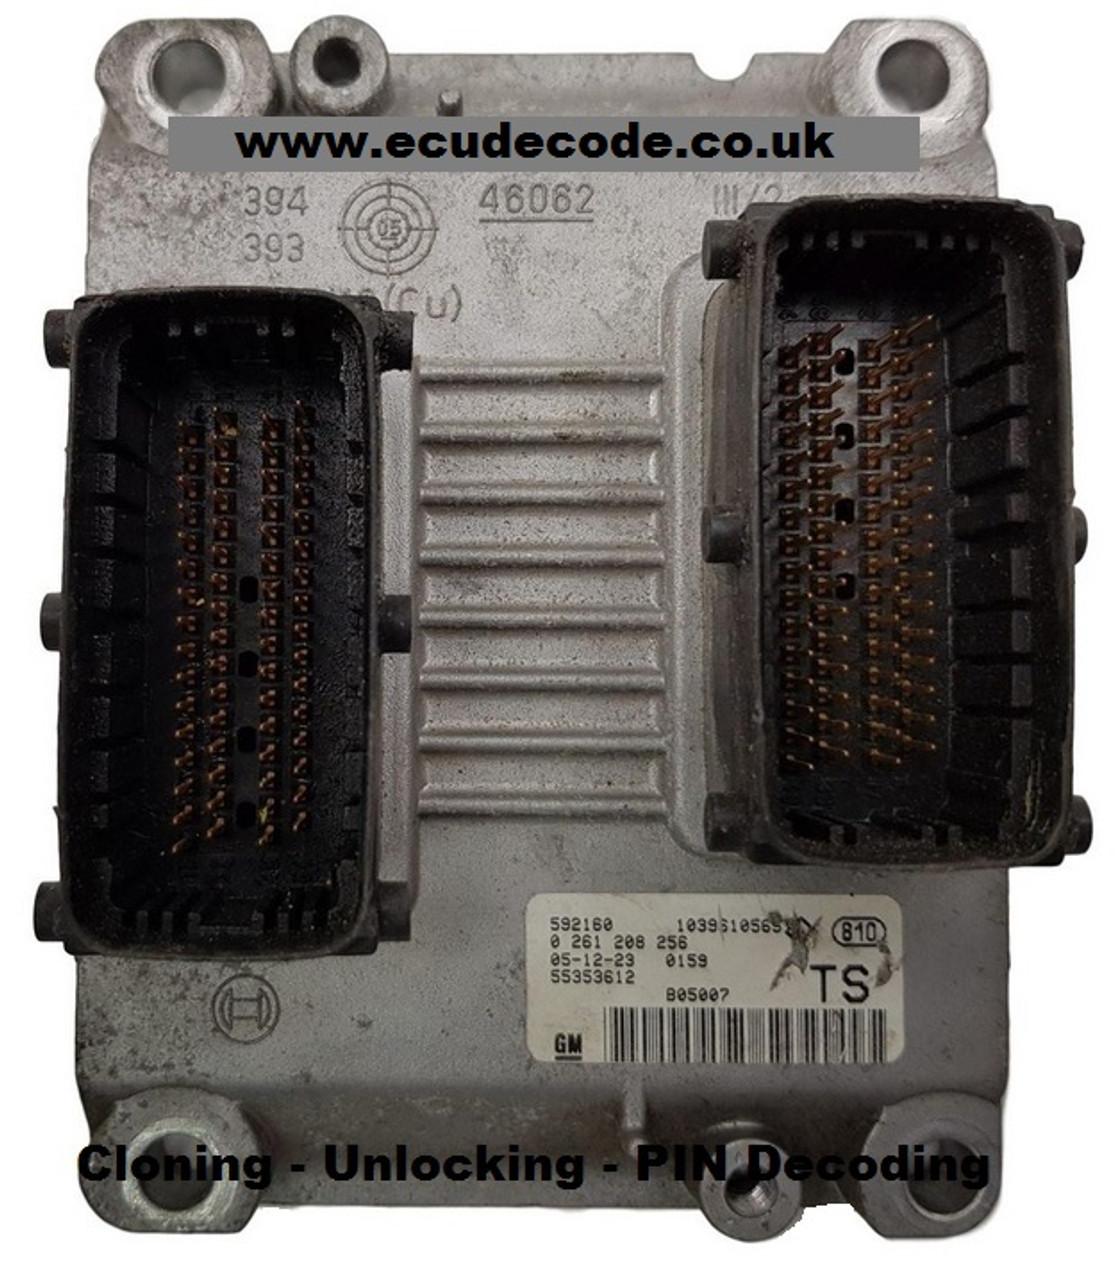 55353612 TS 0261208256 Vauxhall Petrol ECU Plug & Play Services